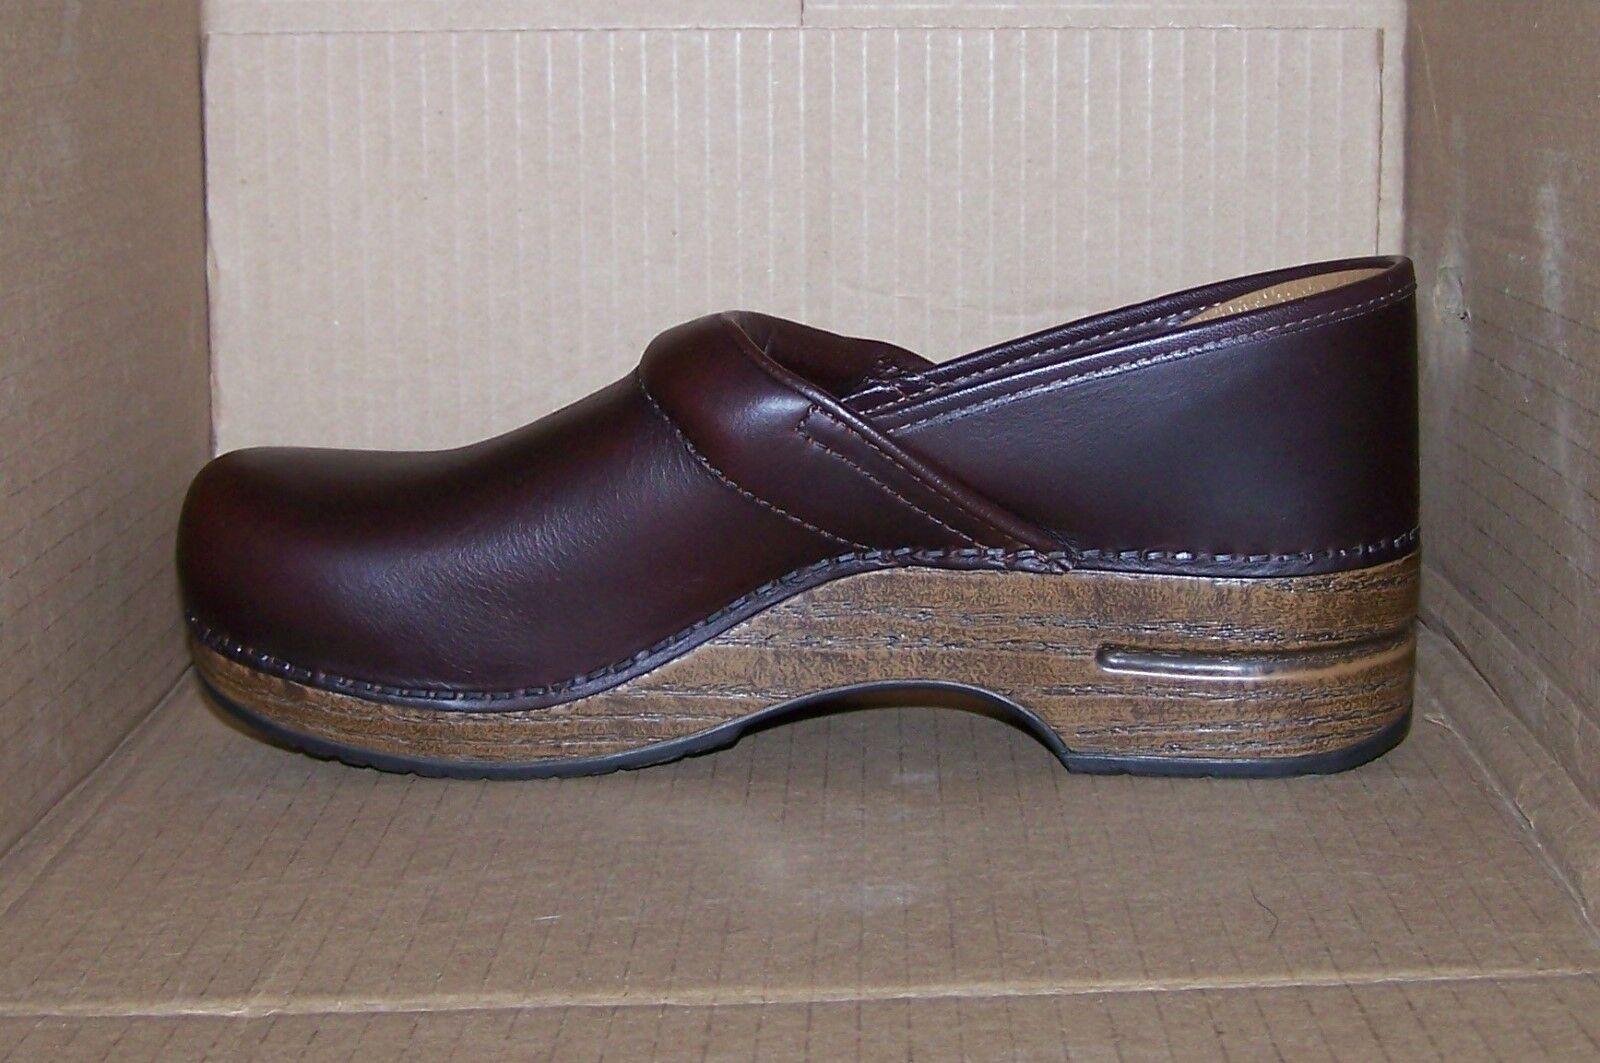 DANSKO 42 Espresso Oiled Leder Occupational Professional Schuhes Clogs 306067878